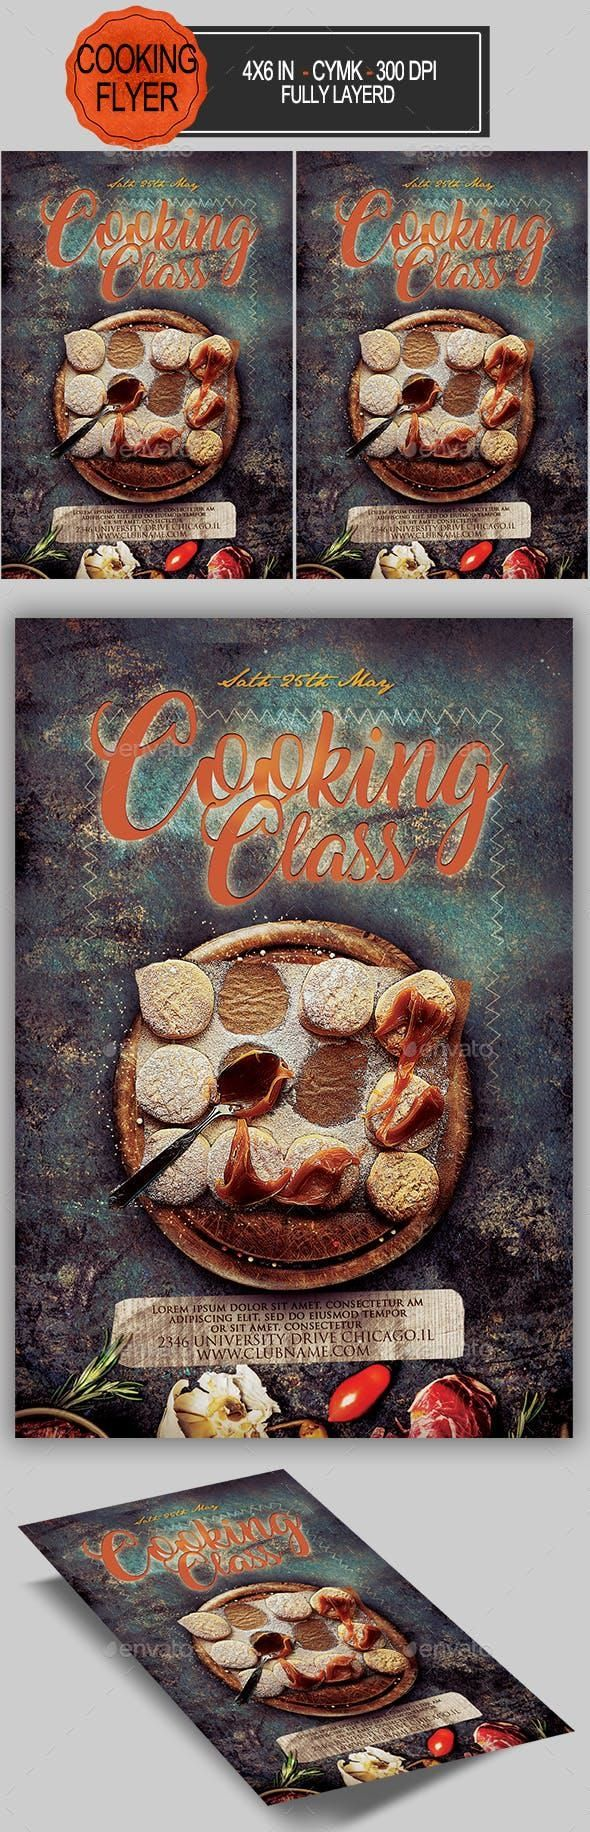 Cooking Classes Flyer Restaurant Flyer Food Infographic Flyer